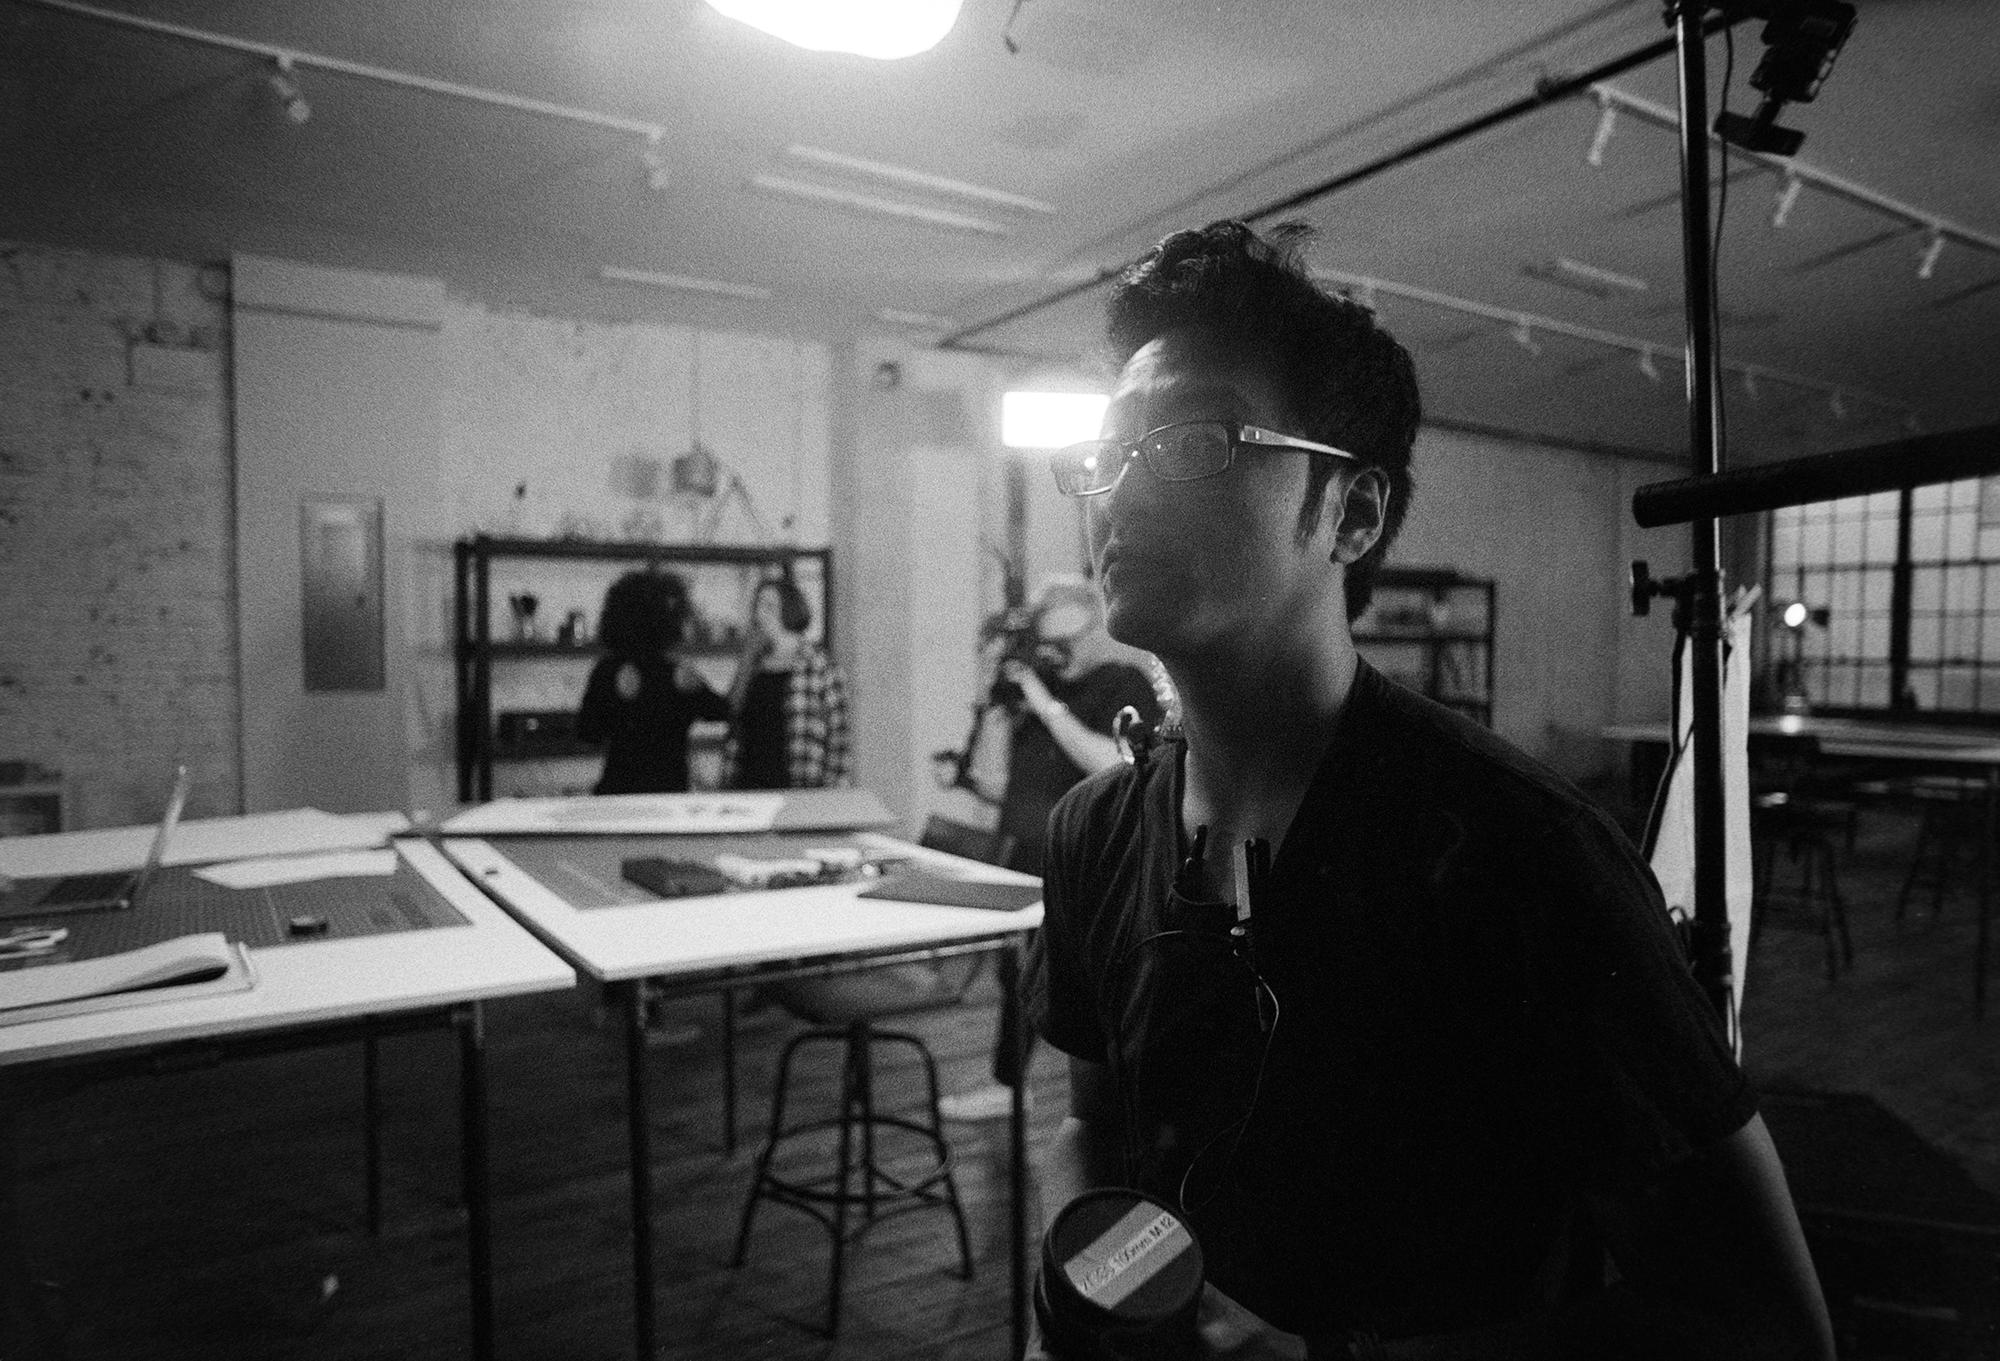 Josh (pictured) let me borrow his minolta 21mm for the next few shots.